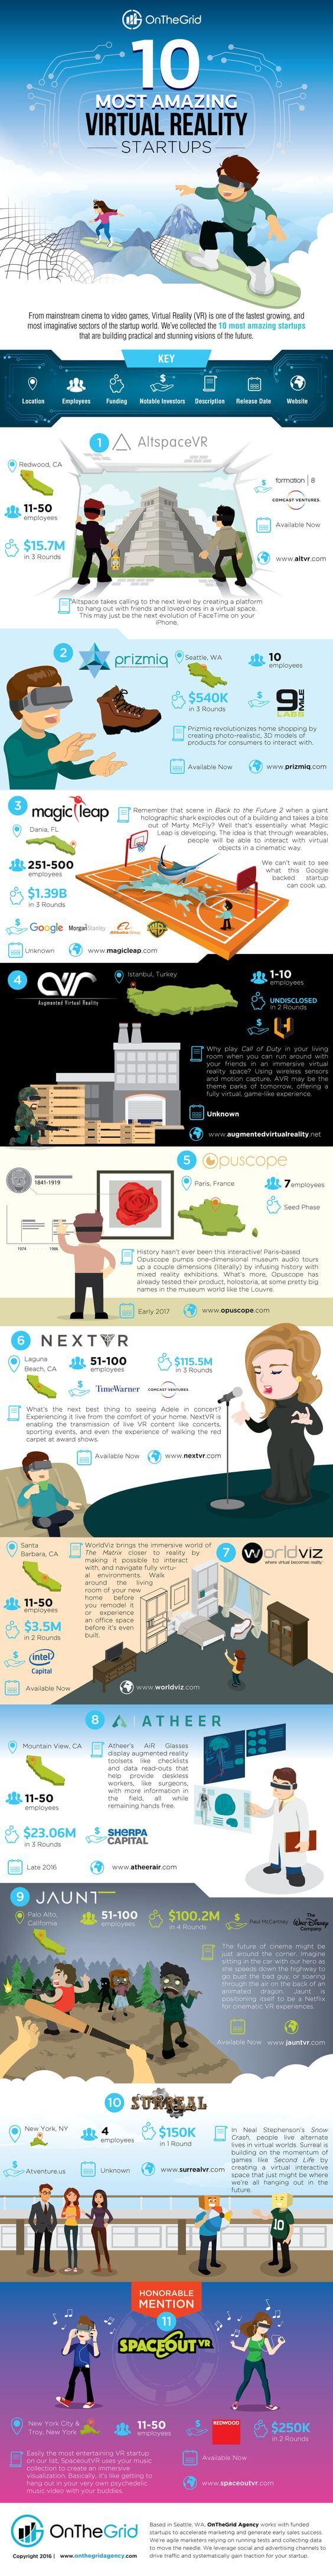 Virtual Reality Startups